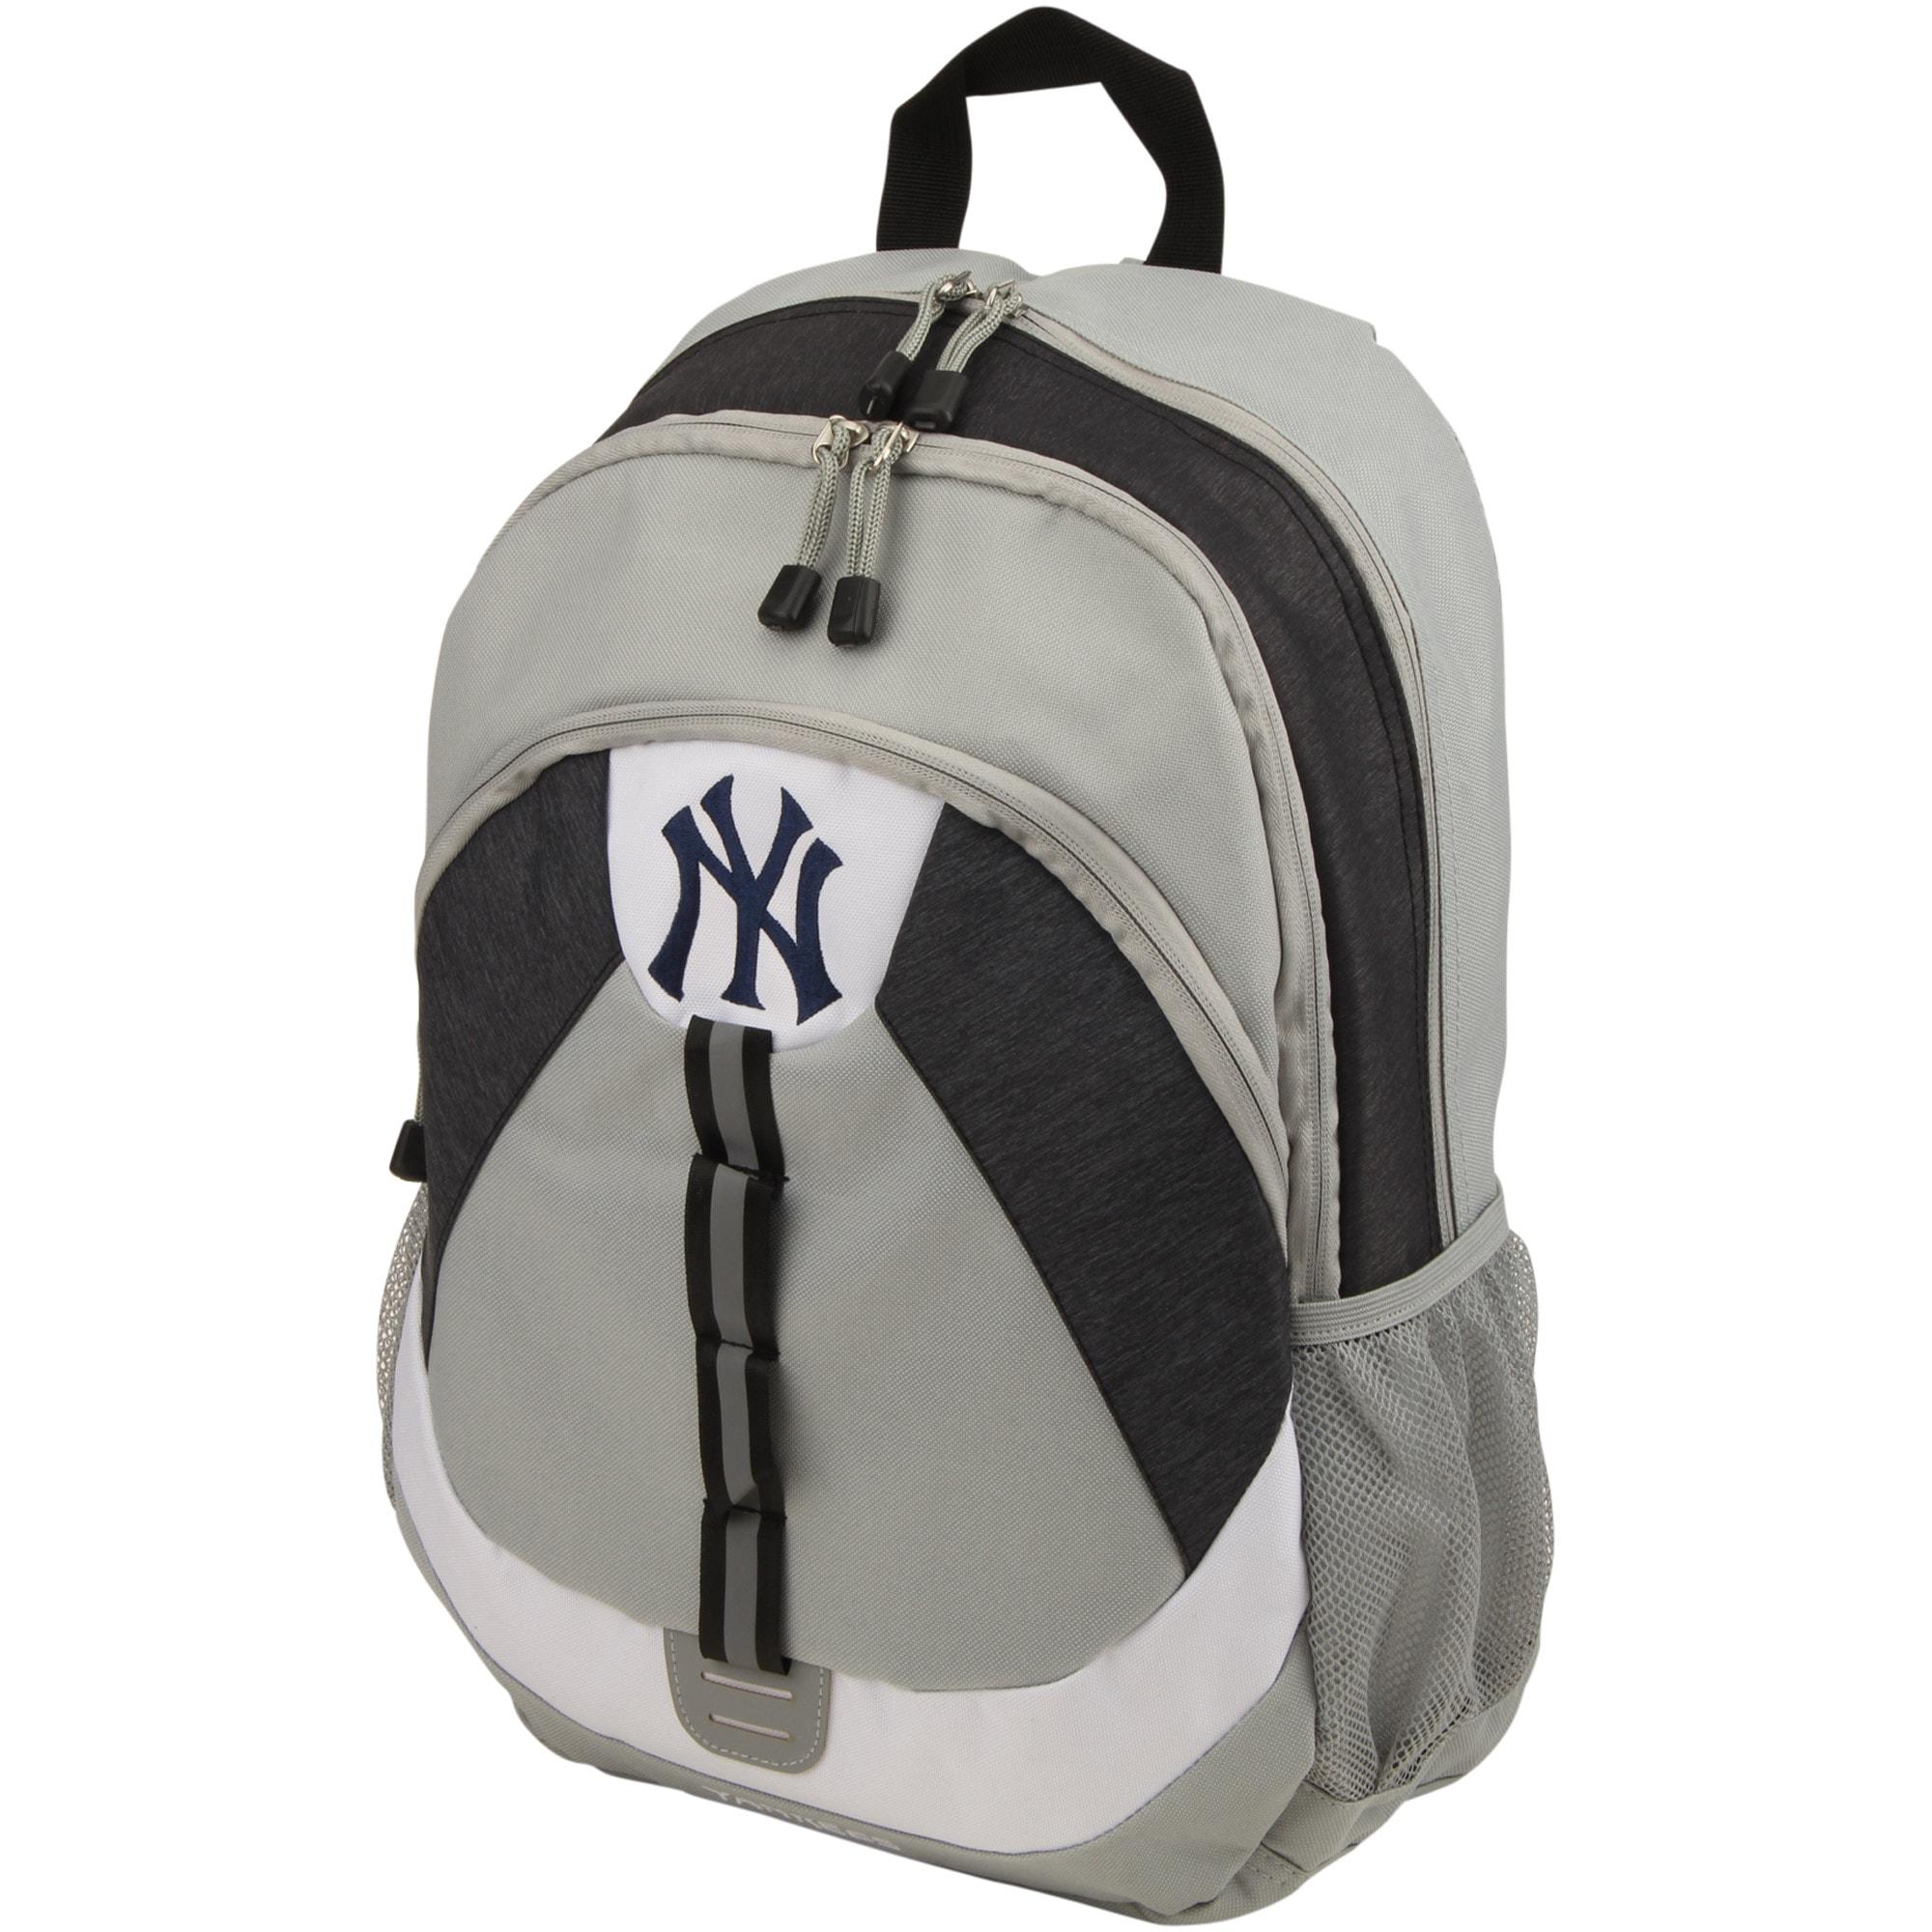 New York Yankees The Northwest Company Women's Kinetic Backpack - Gray